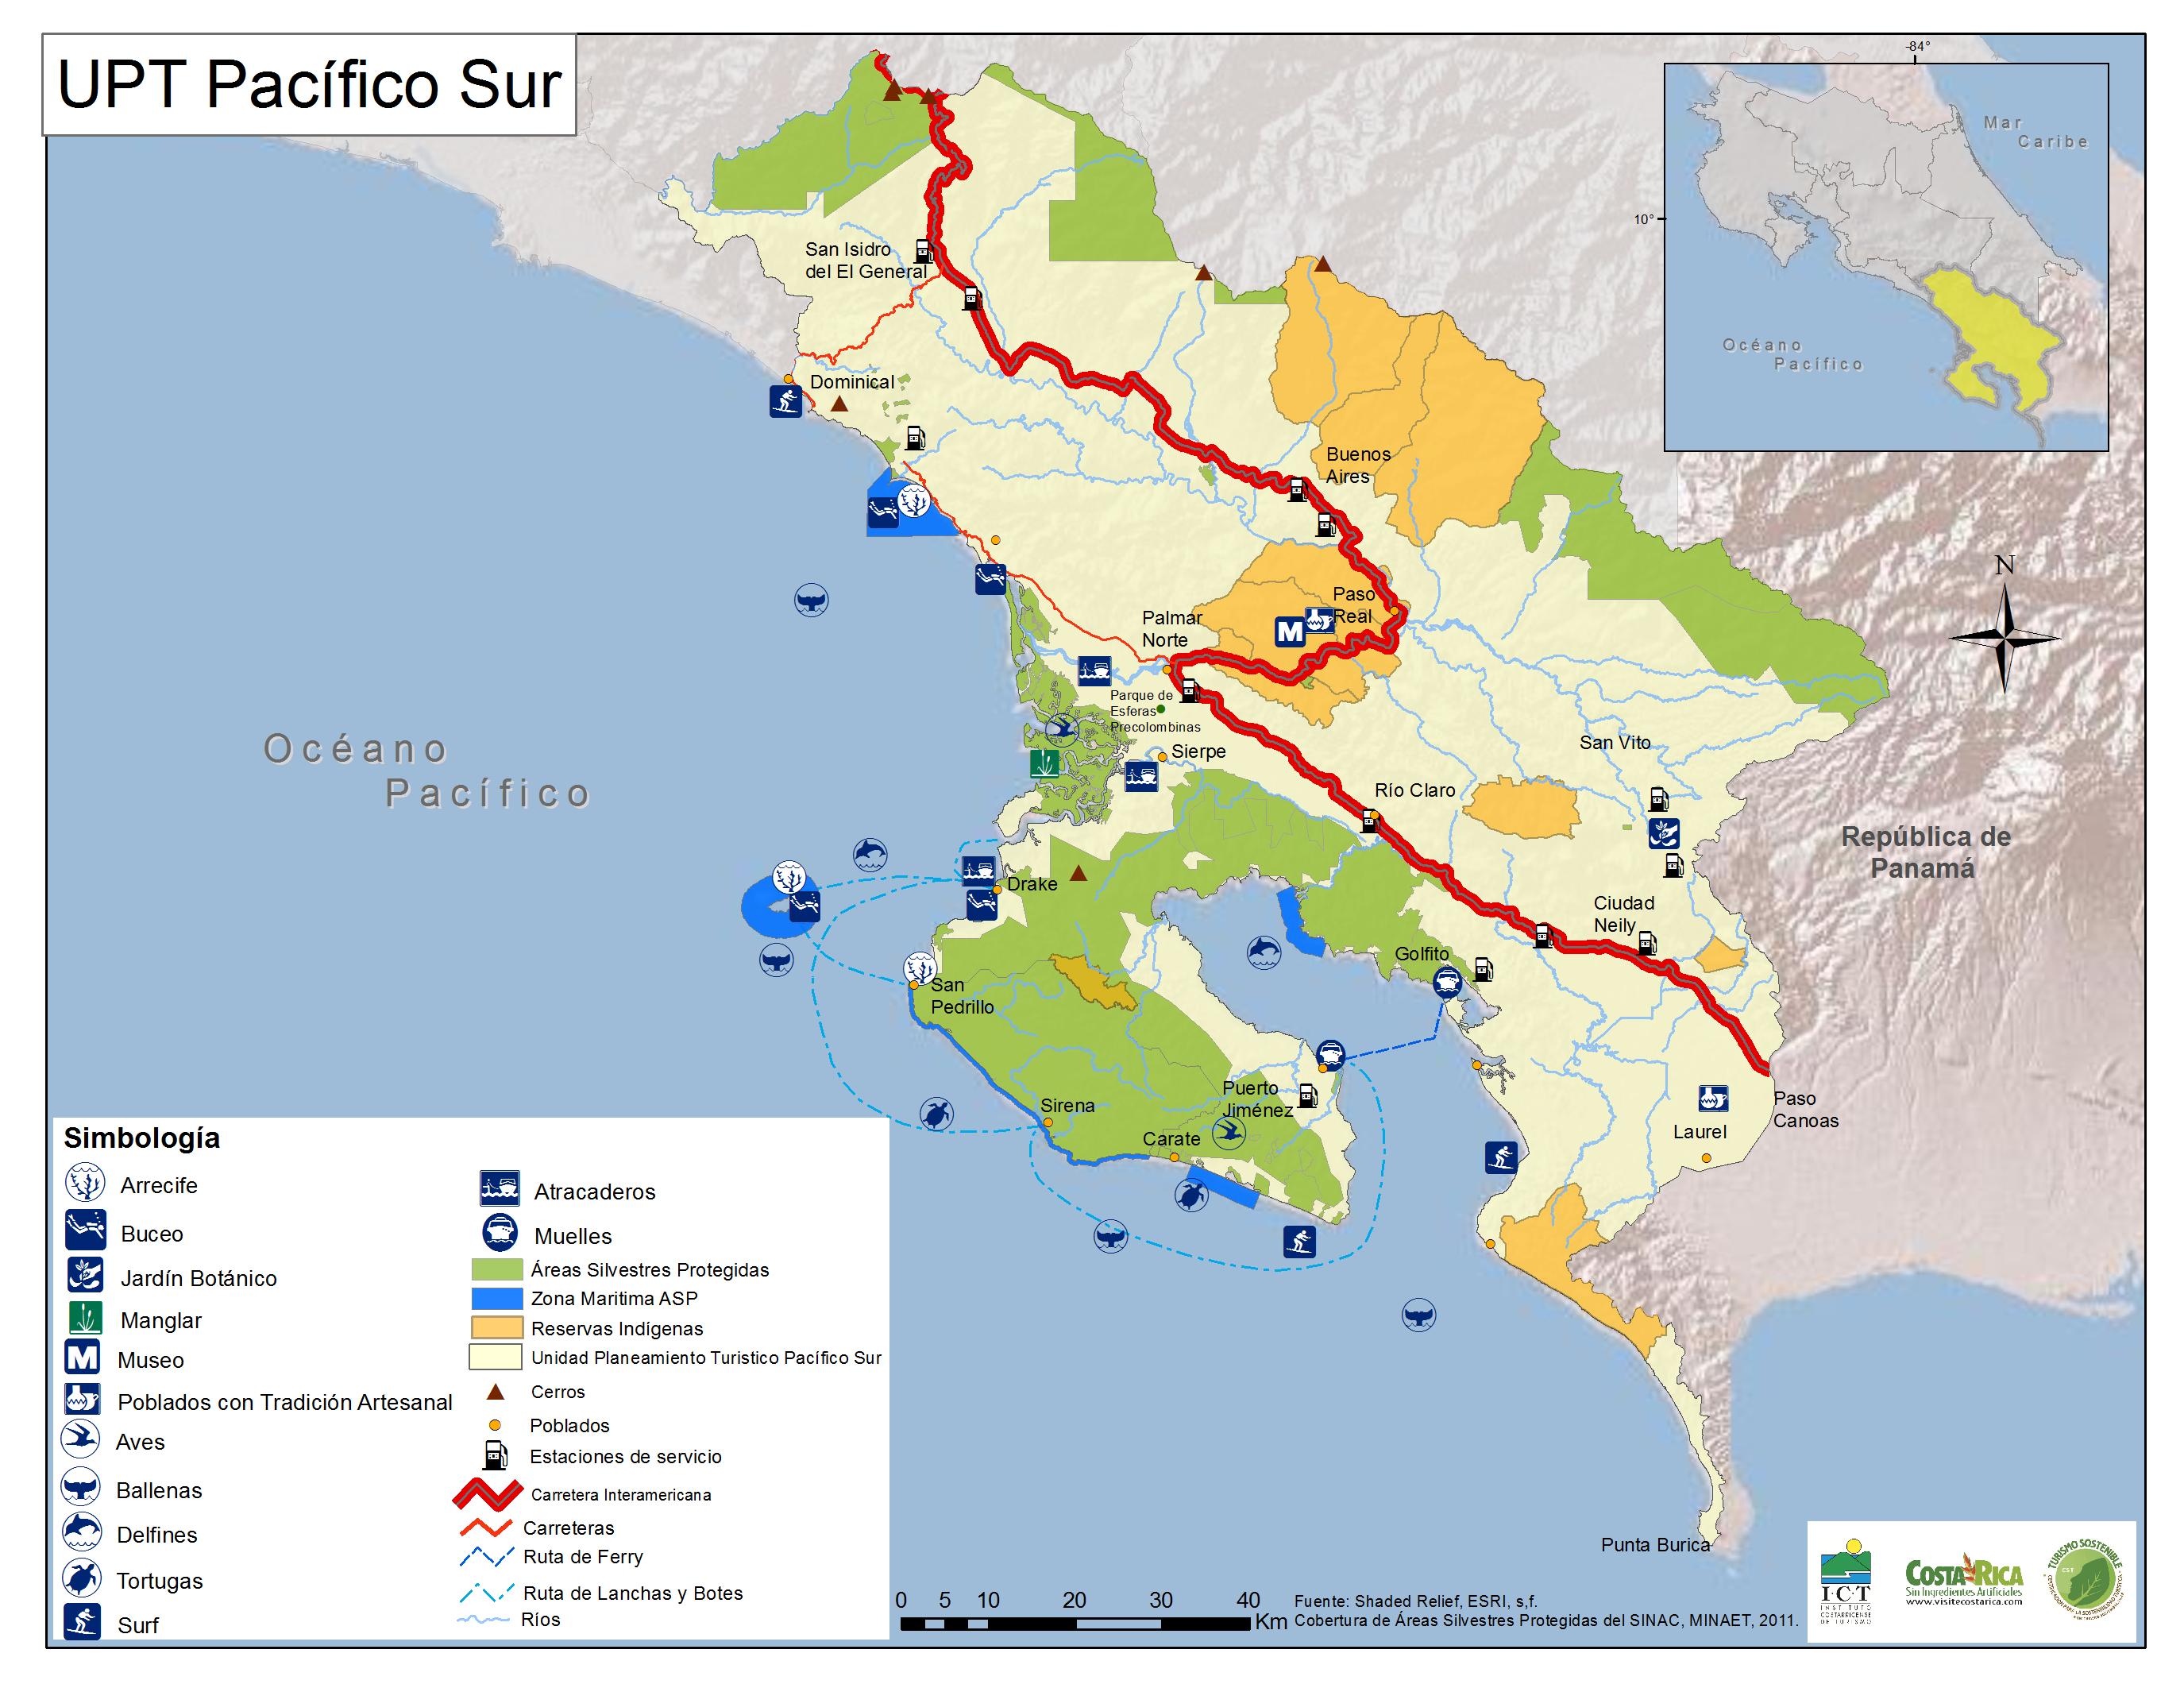 Carte du Pacifique Sud - Costa Rica